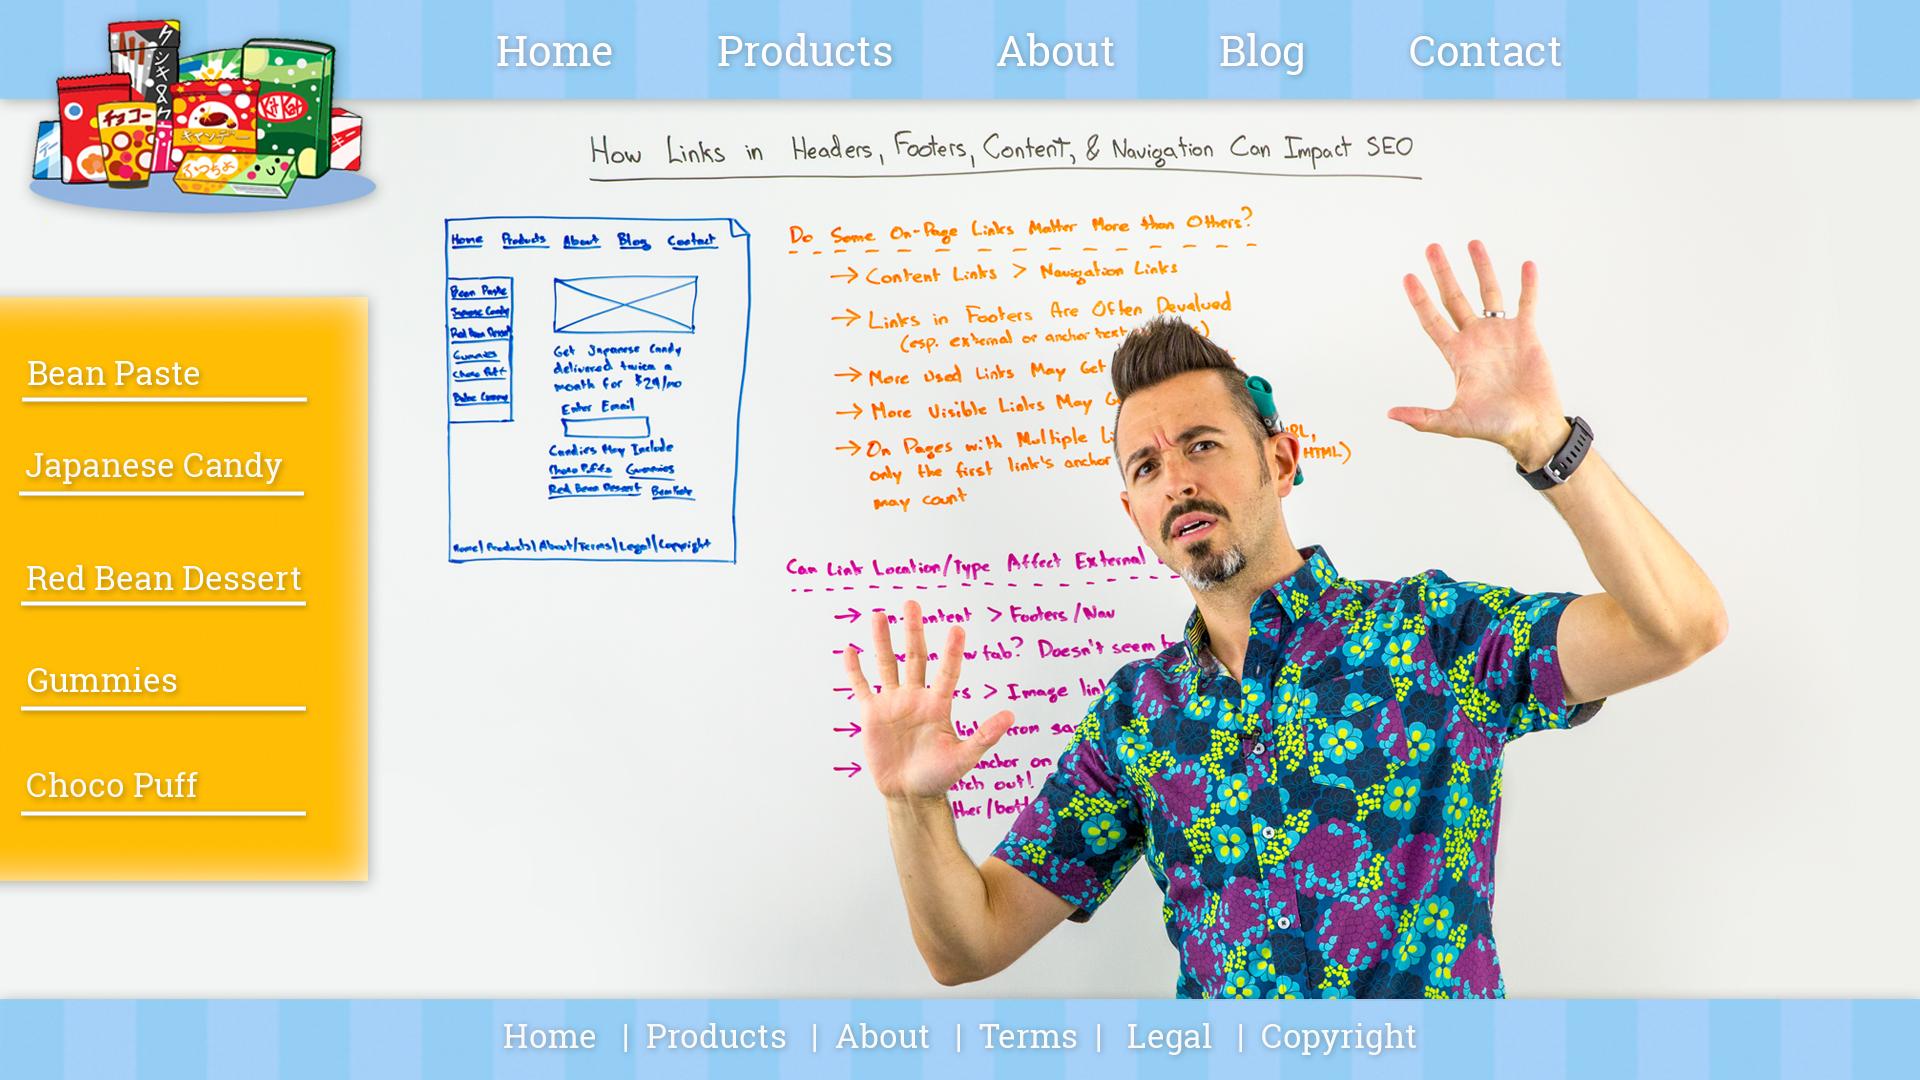 https://moz.com/blog/links-headers-footers-navigation-impact-seo